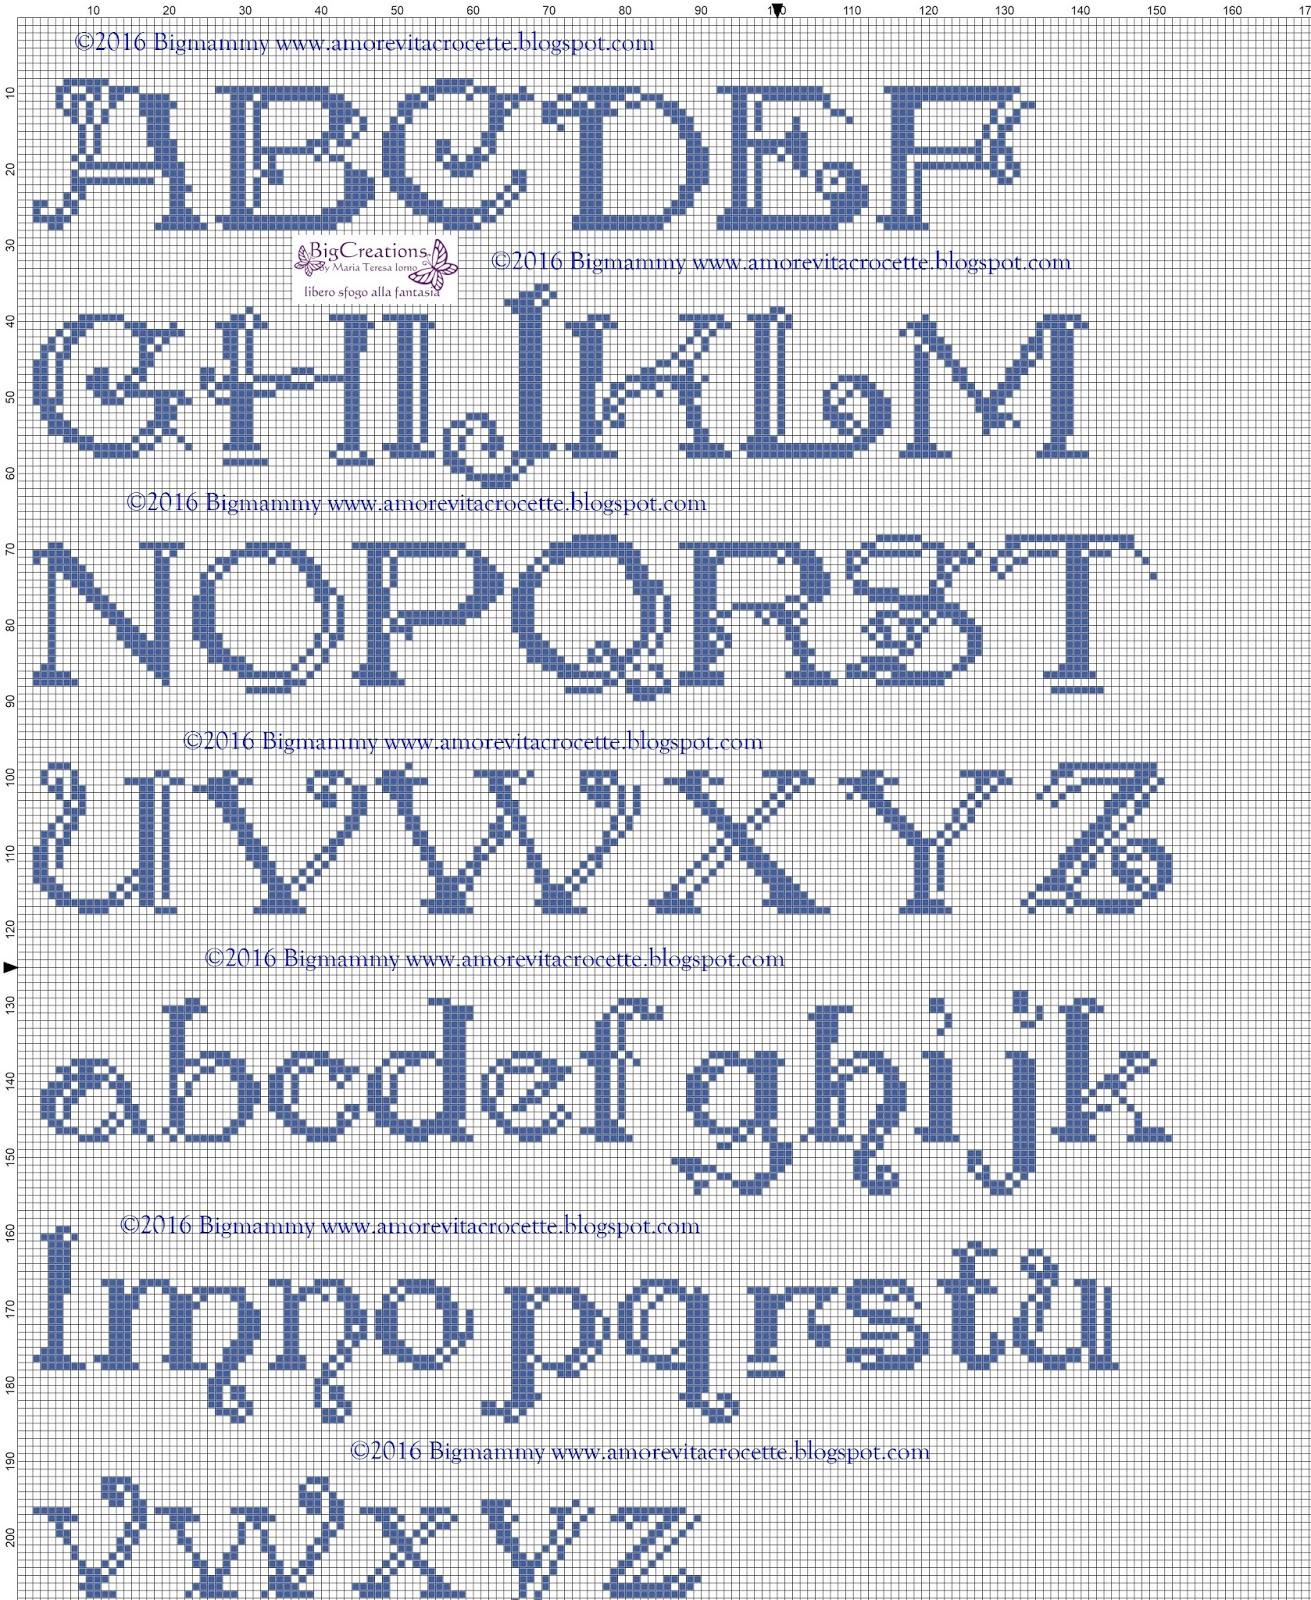 Amorevitacrocette ancora alfabeti a punto croce for Alfabeti a punto croce per bambini